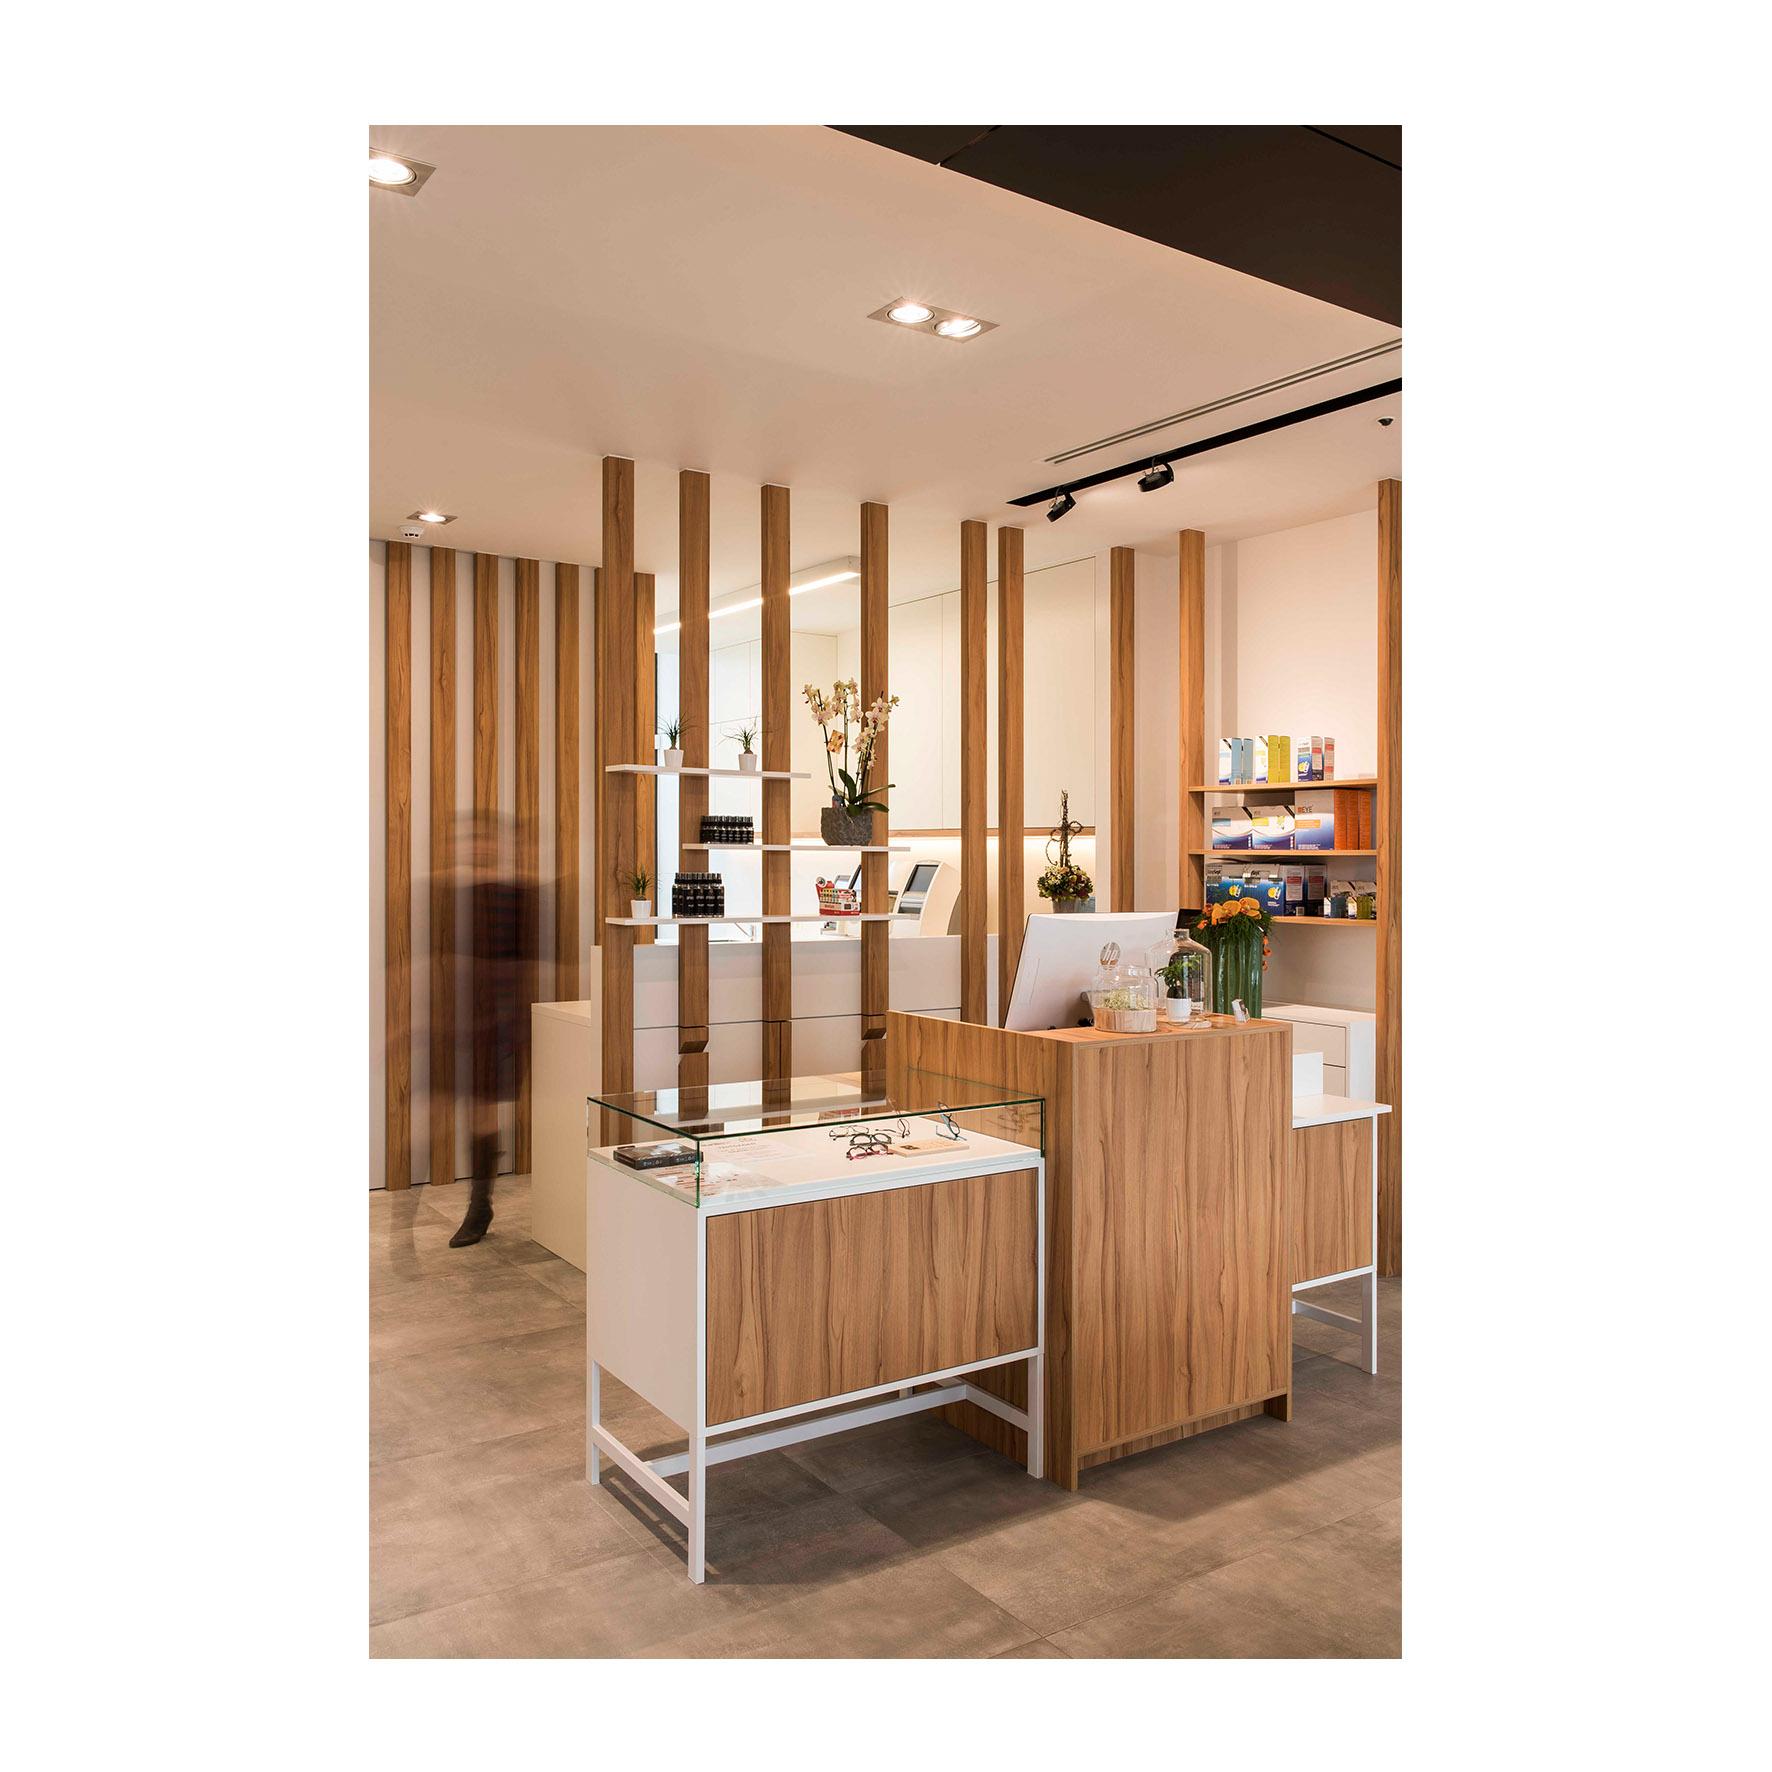 Interieurfotografie - Bas Vrehen, Atelier Leise